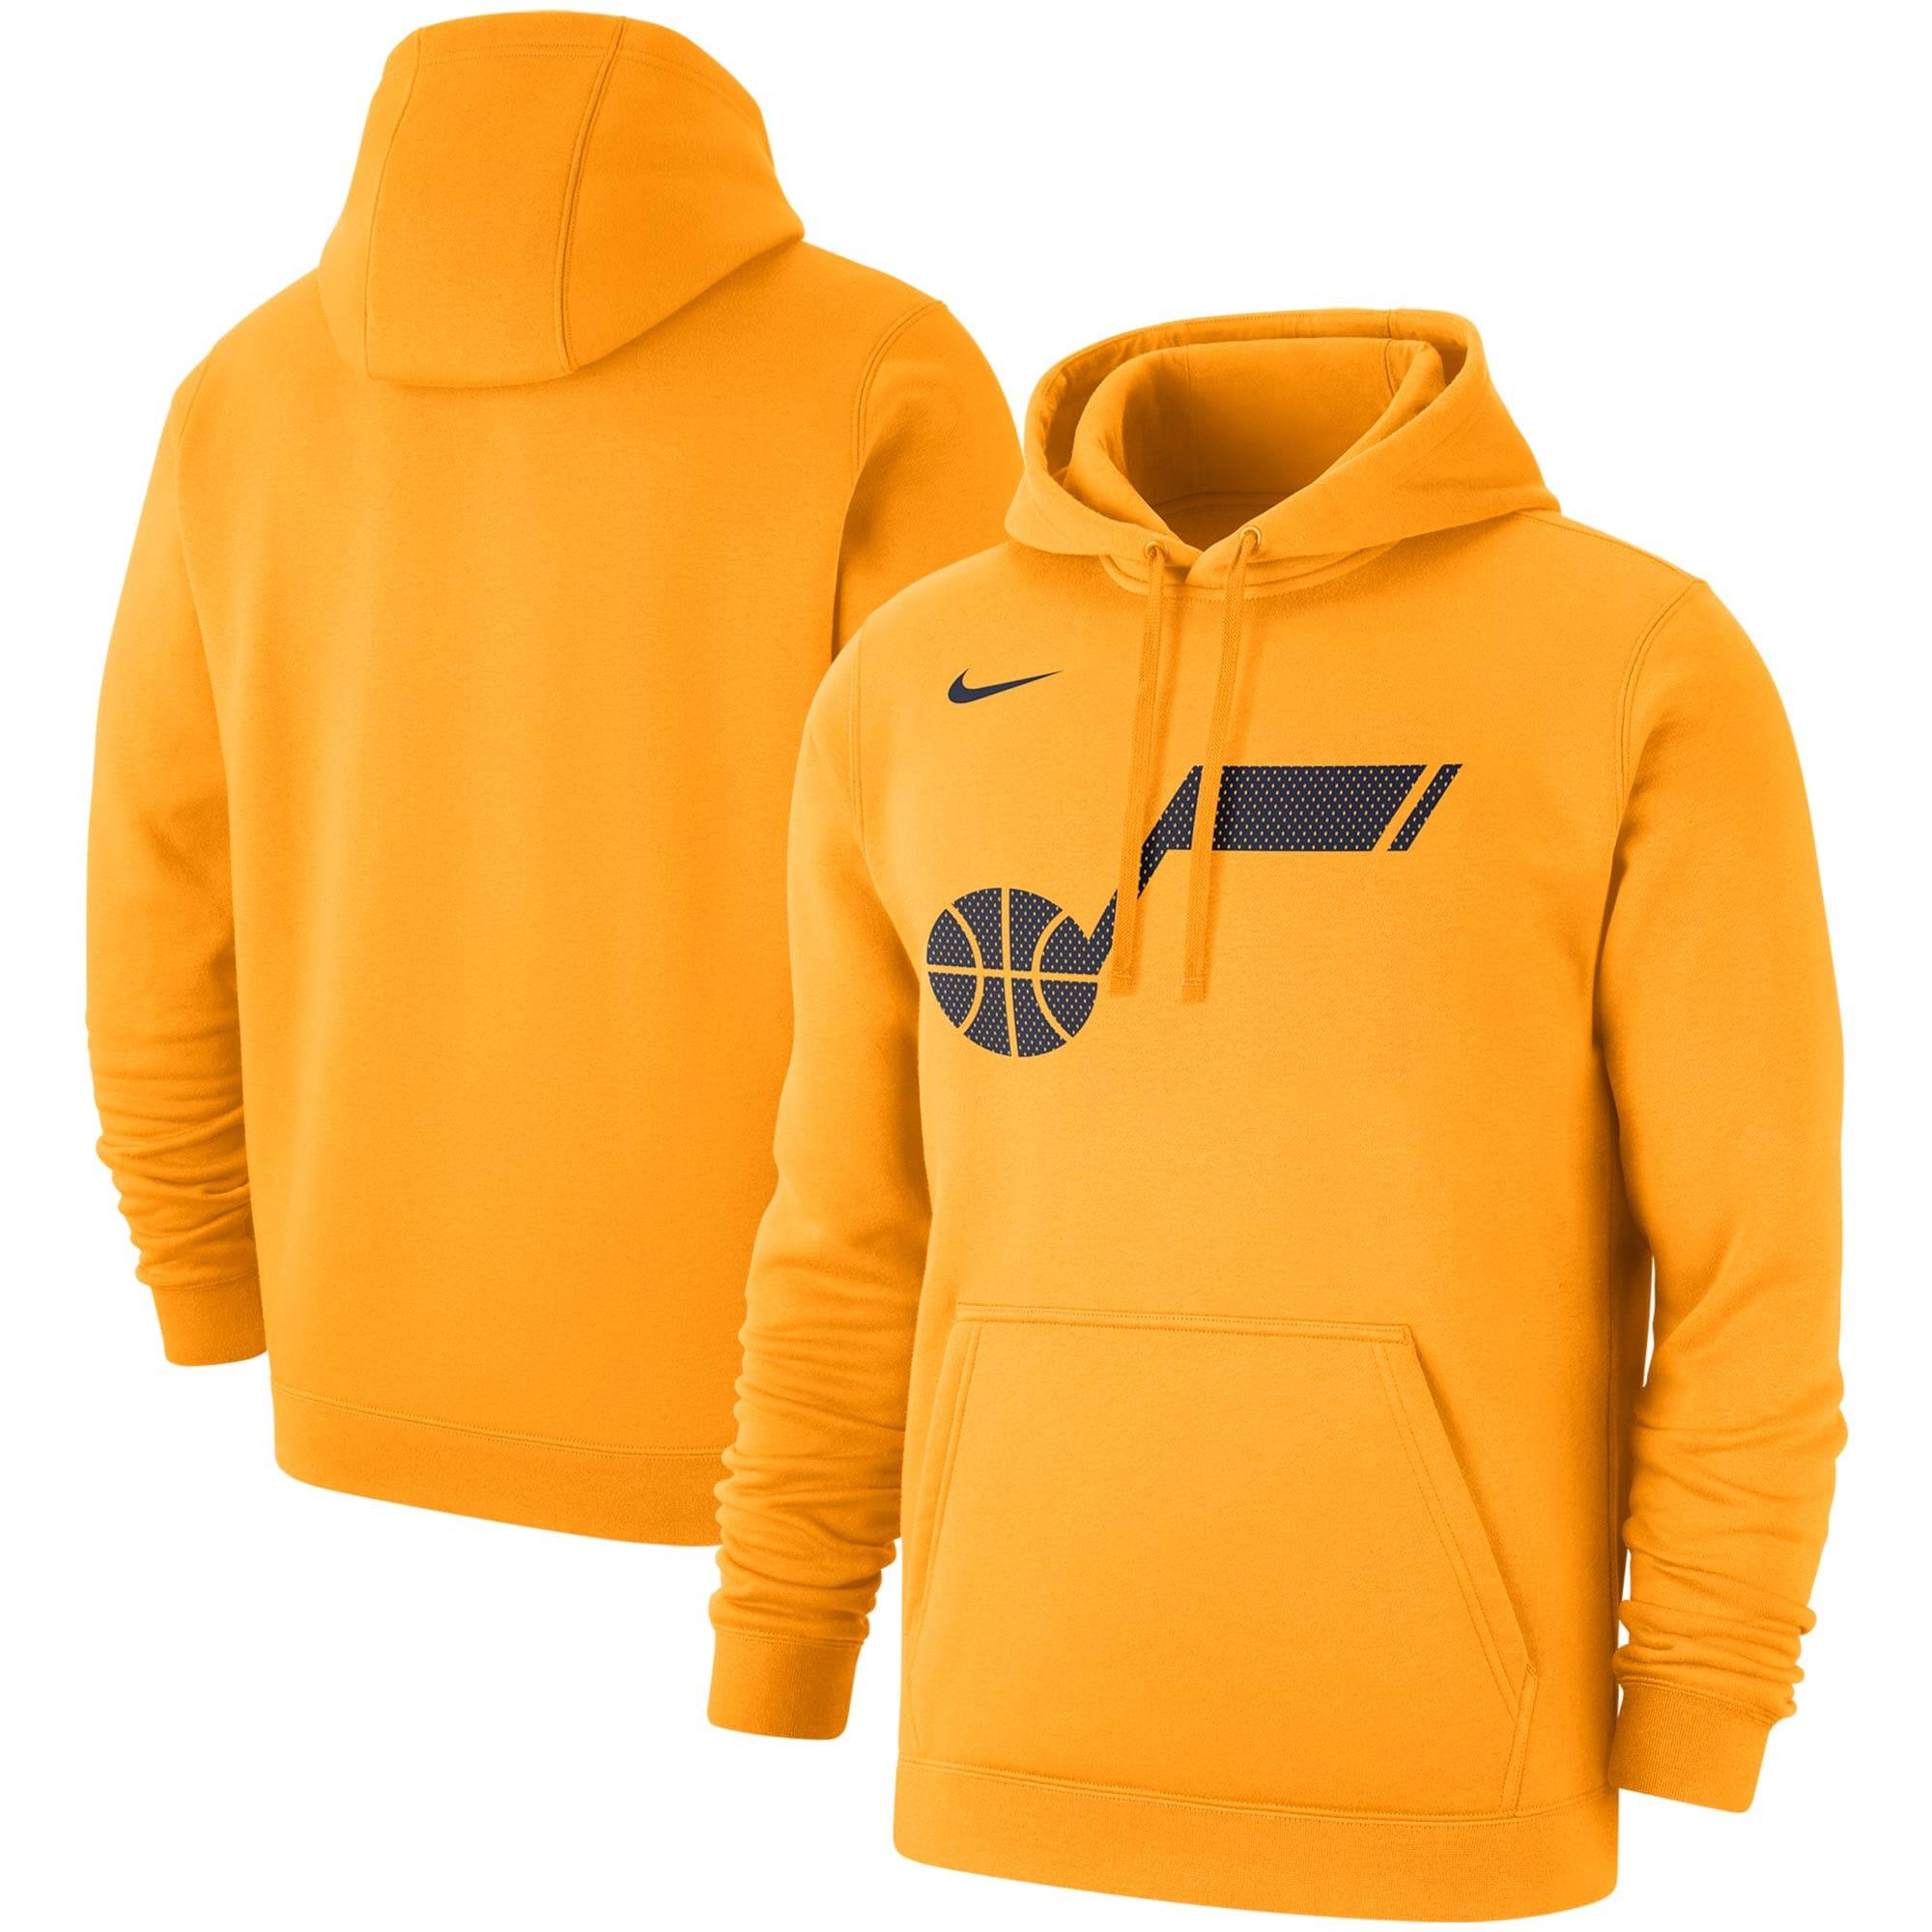 Utah Jazz Nike 2019/20 Statement Edition Club Pullover Hoodie - Gold